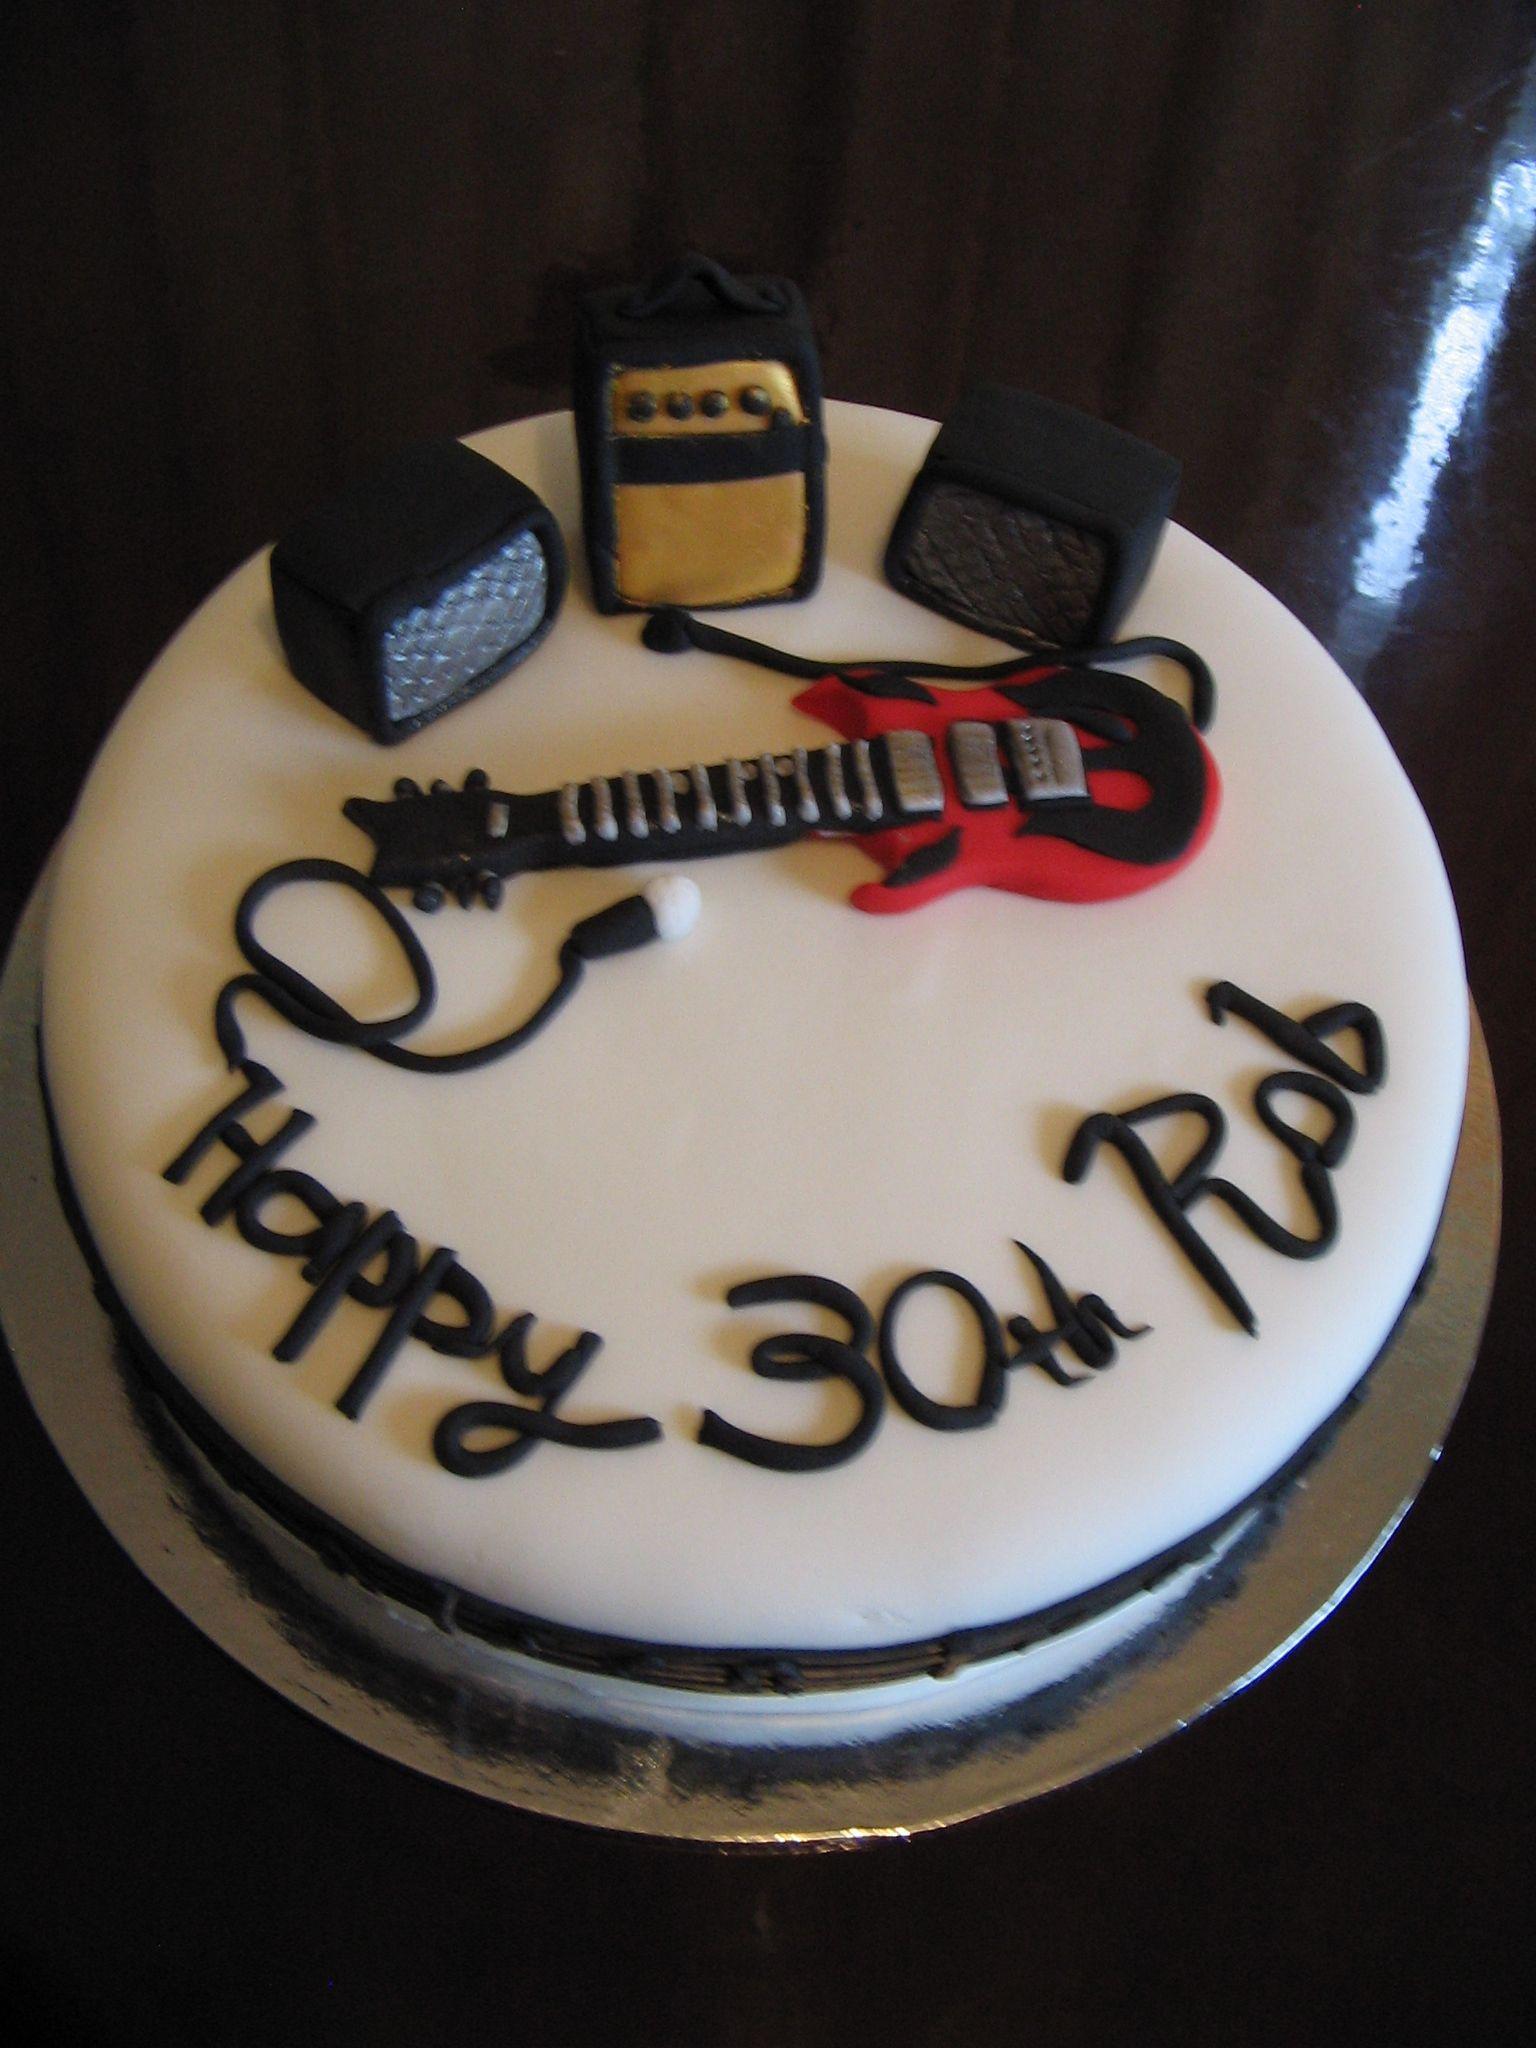 Cake Decoration For Bass Guitar Player